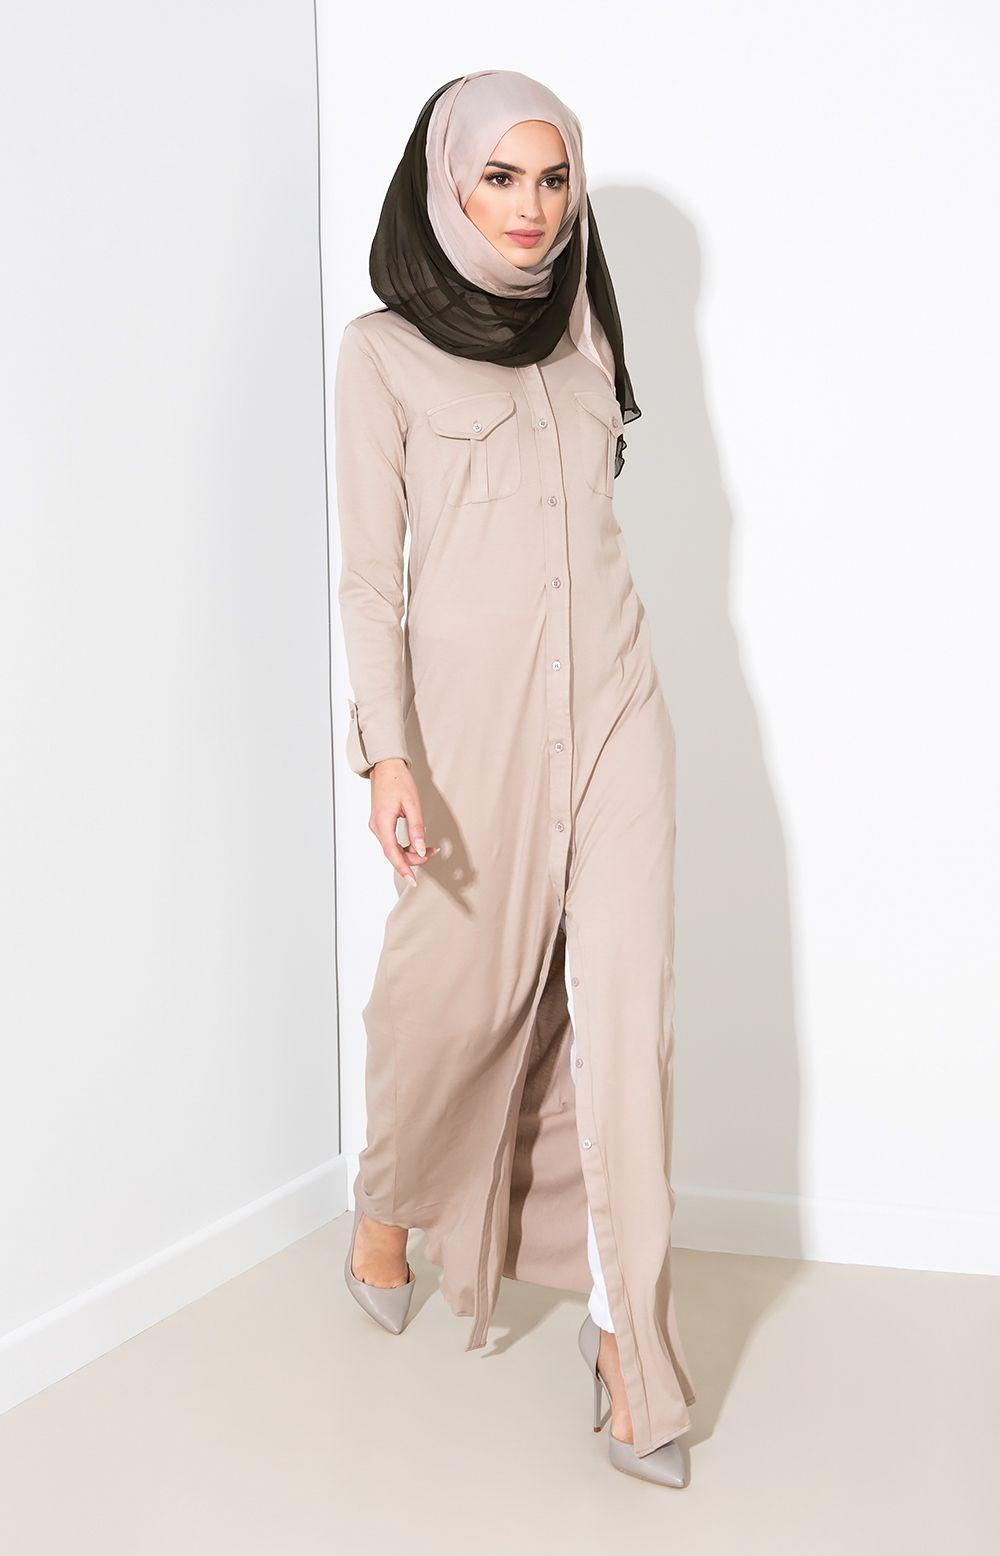 Aab uk long shirt ice coffee standard view fashion islamic